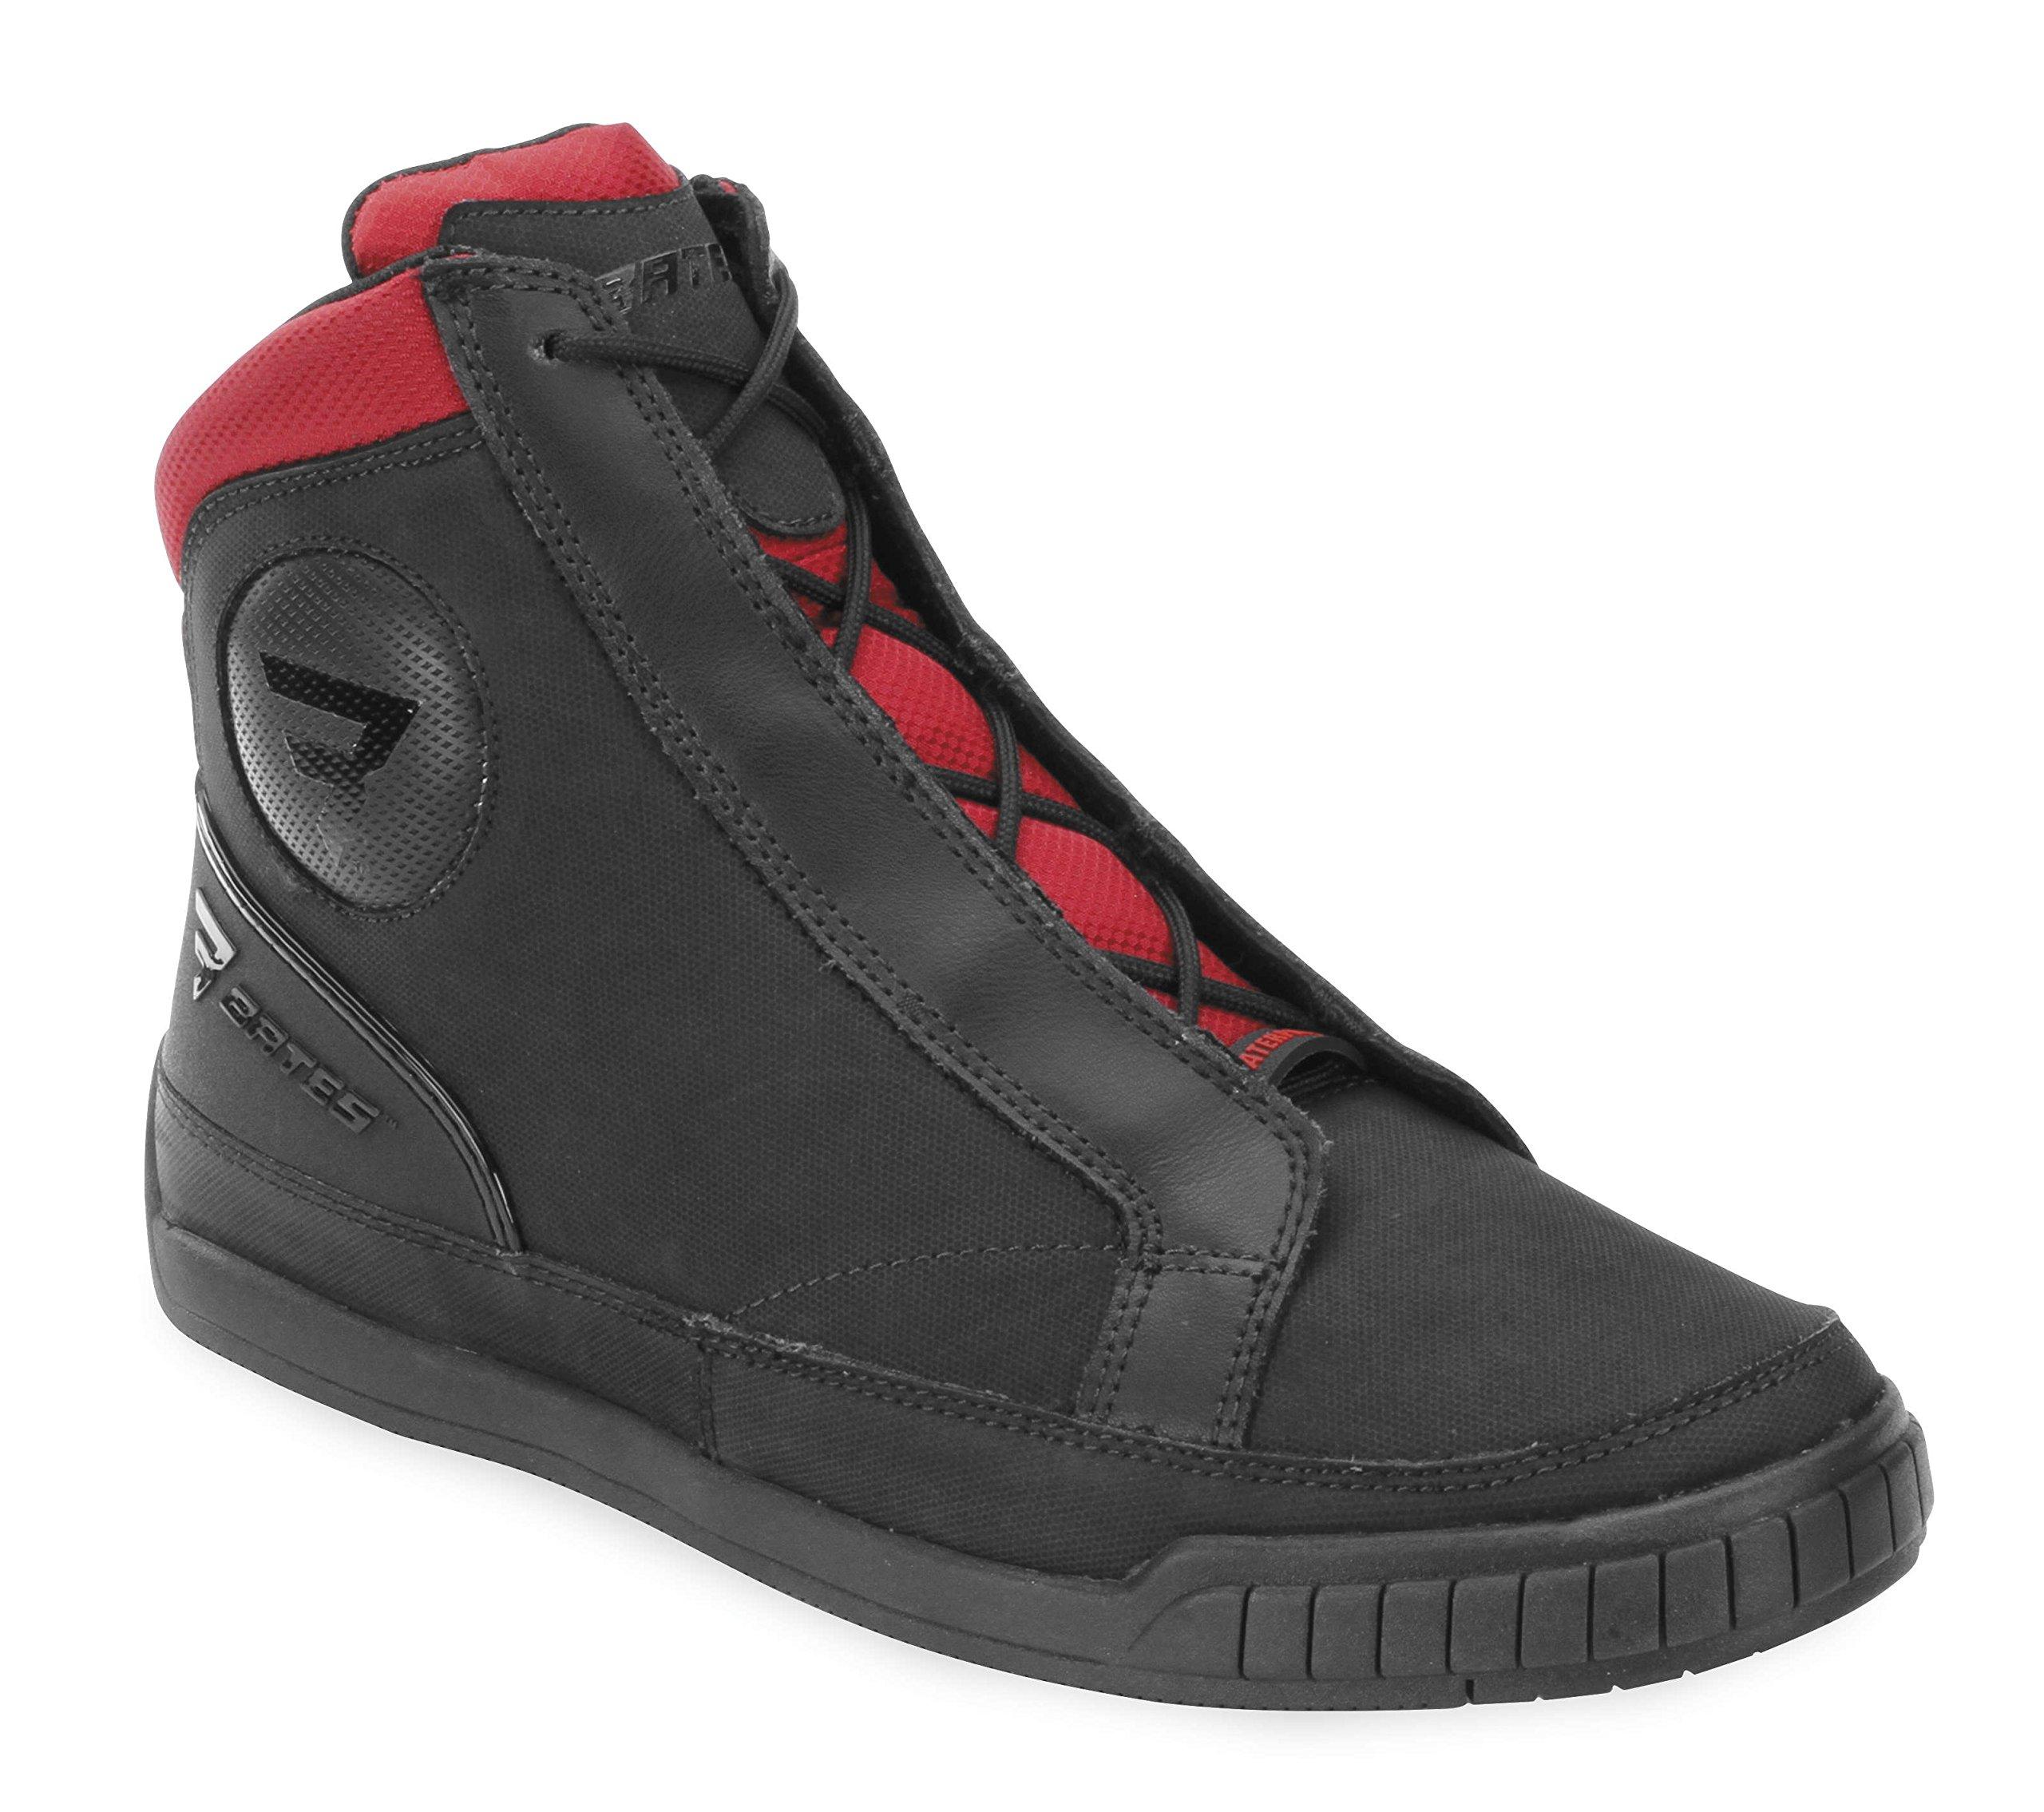 Bates Taser Performance Men's Motorcycle Boots (Black/Red, Size 12)